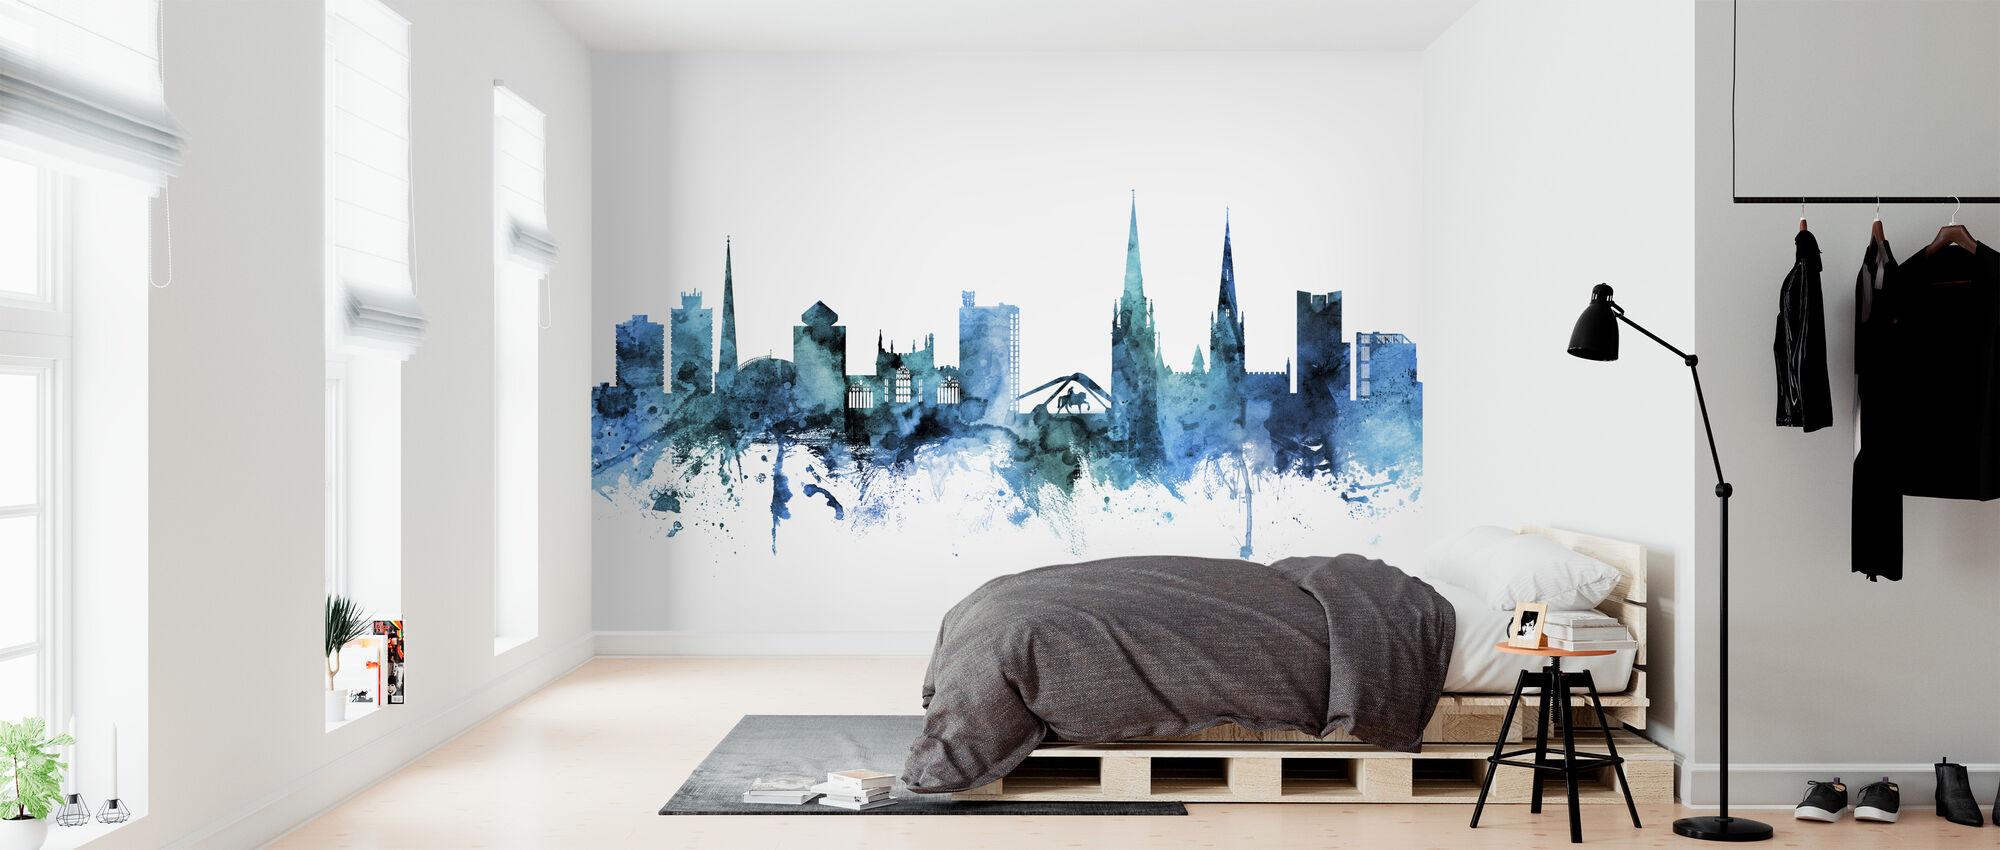 Coventry England Skyline - Wallpaper - Bedroom